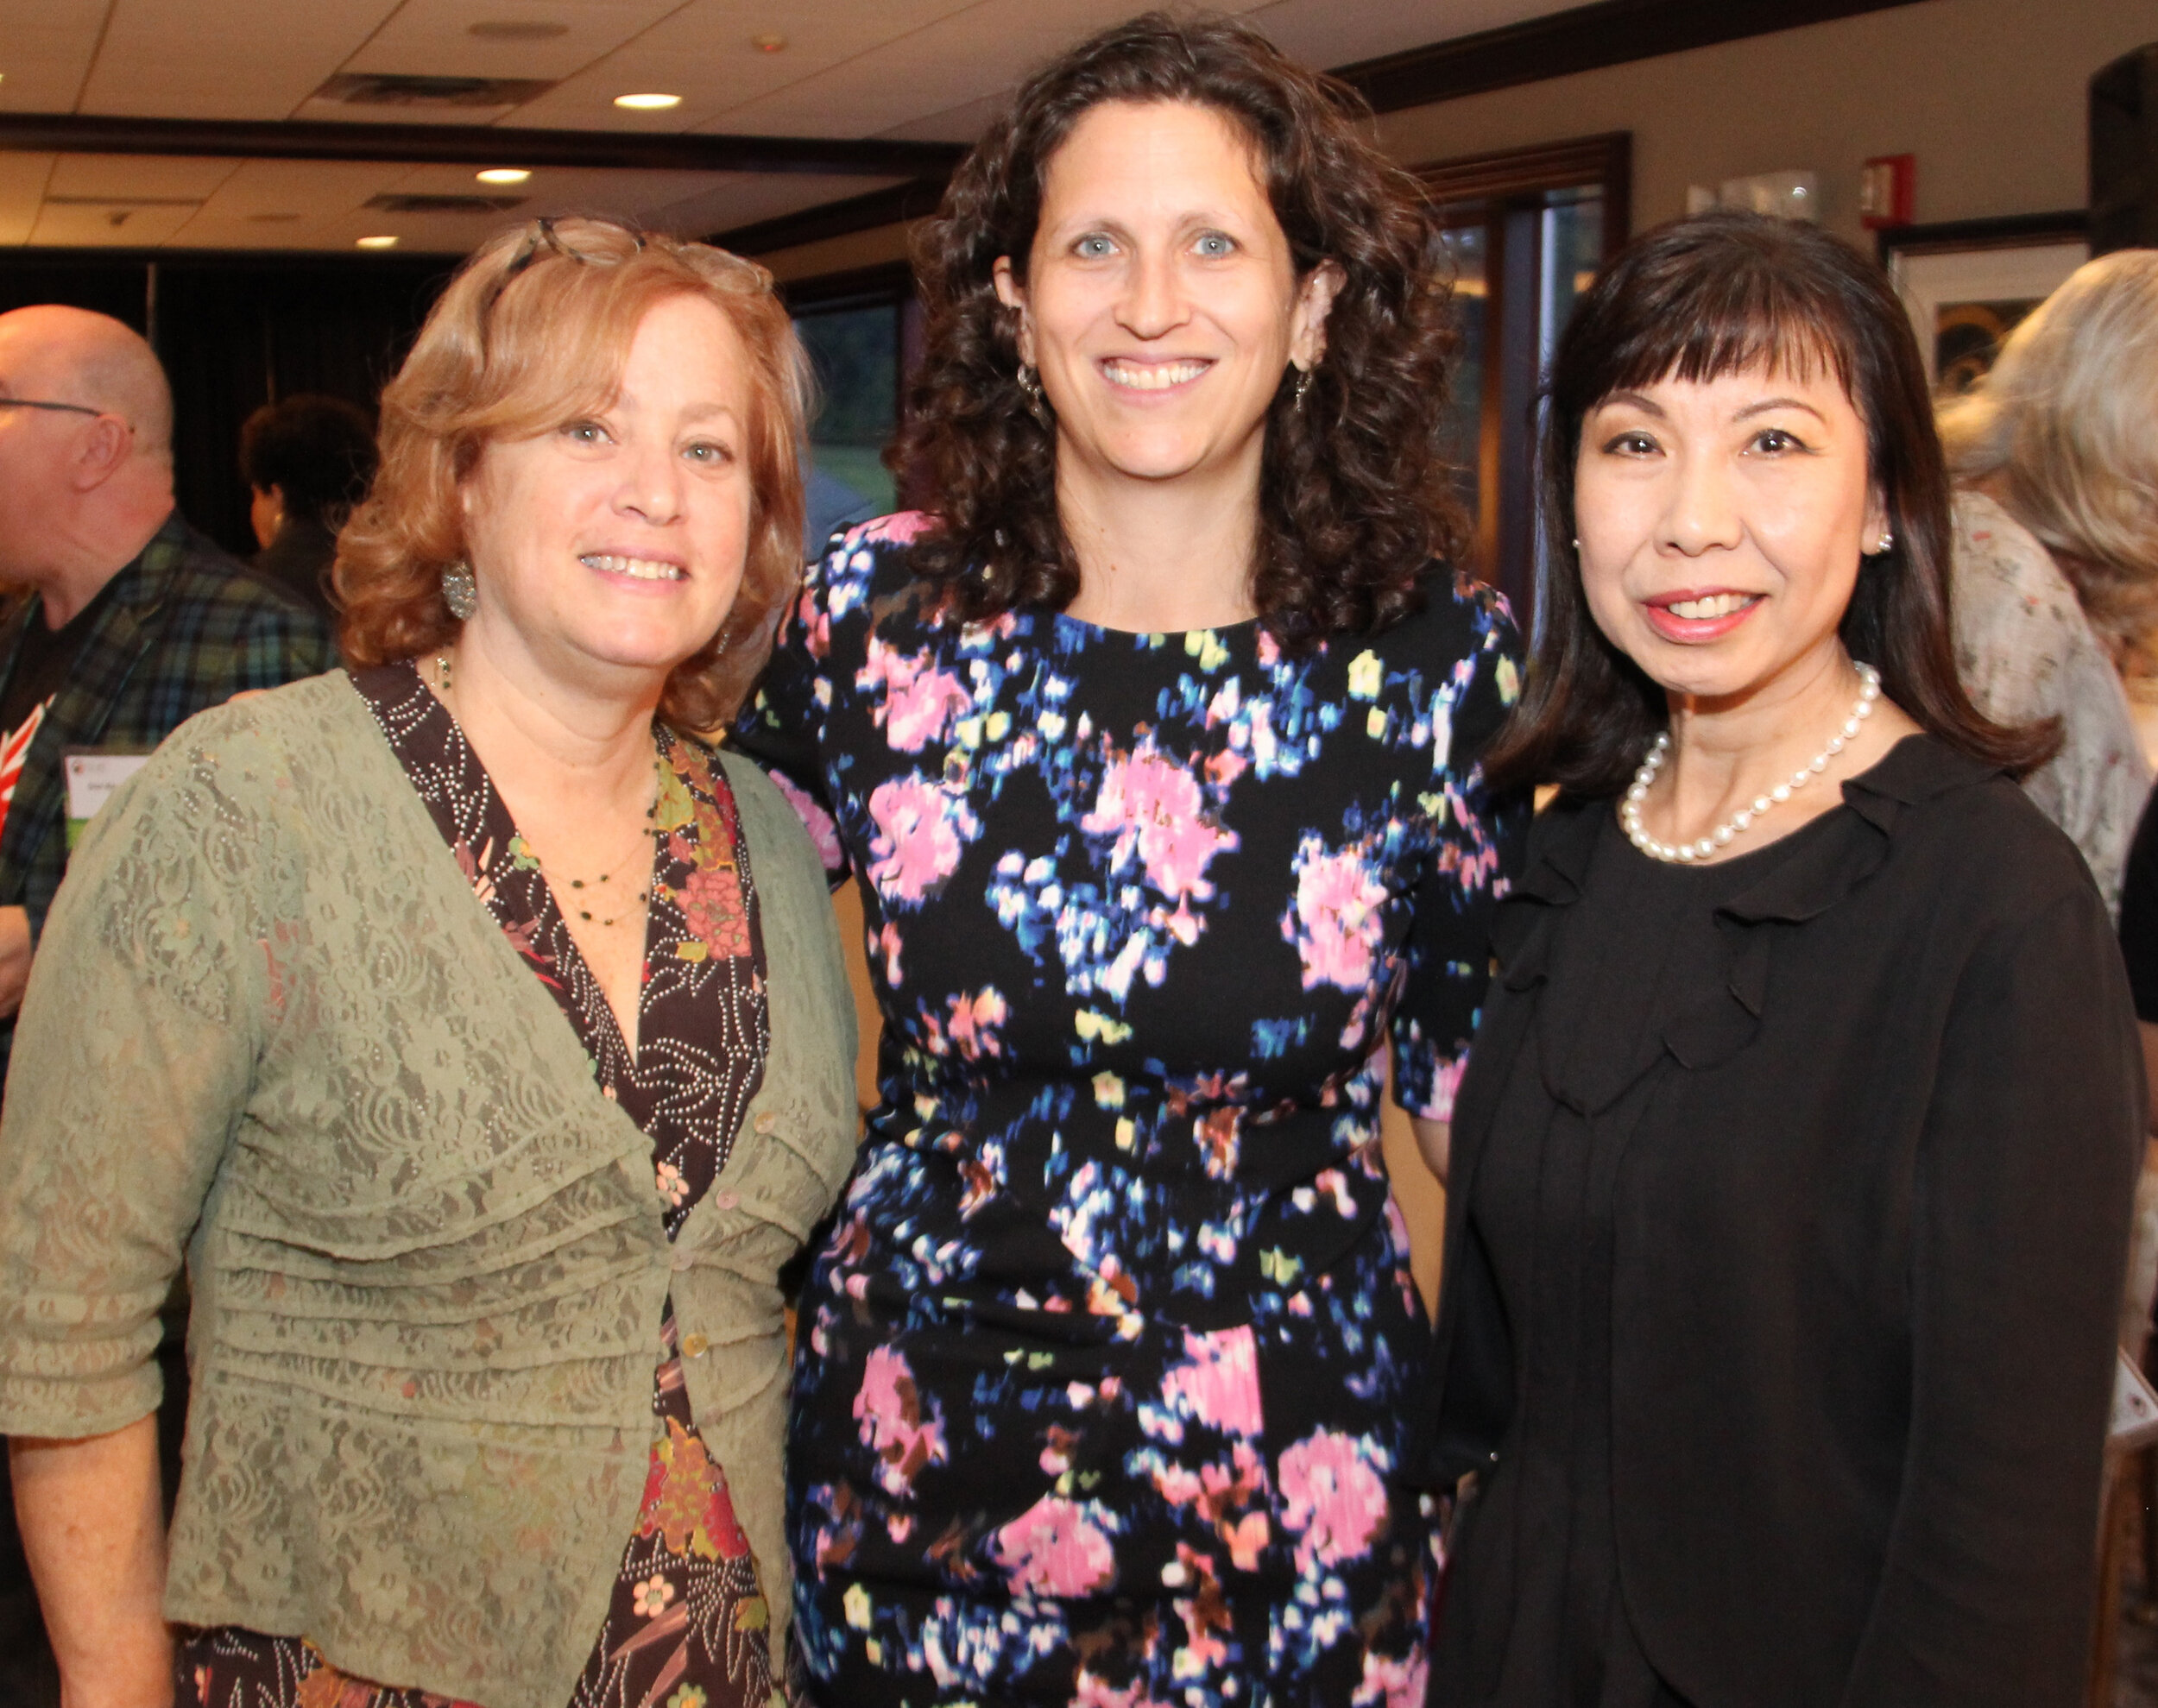 Carol Chevlowe, CAC Board President, Emily Peck, CAC Executive Director, Sally Ng, CAC Board Vice-President